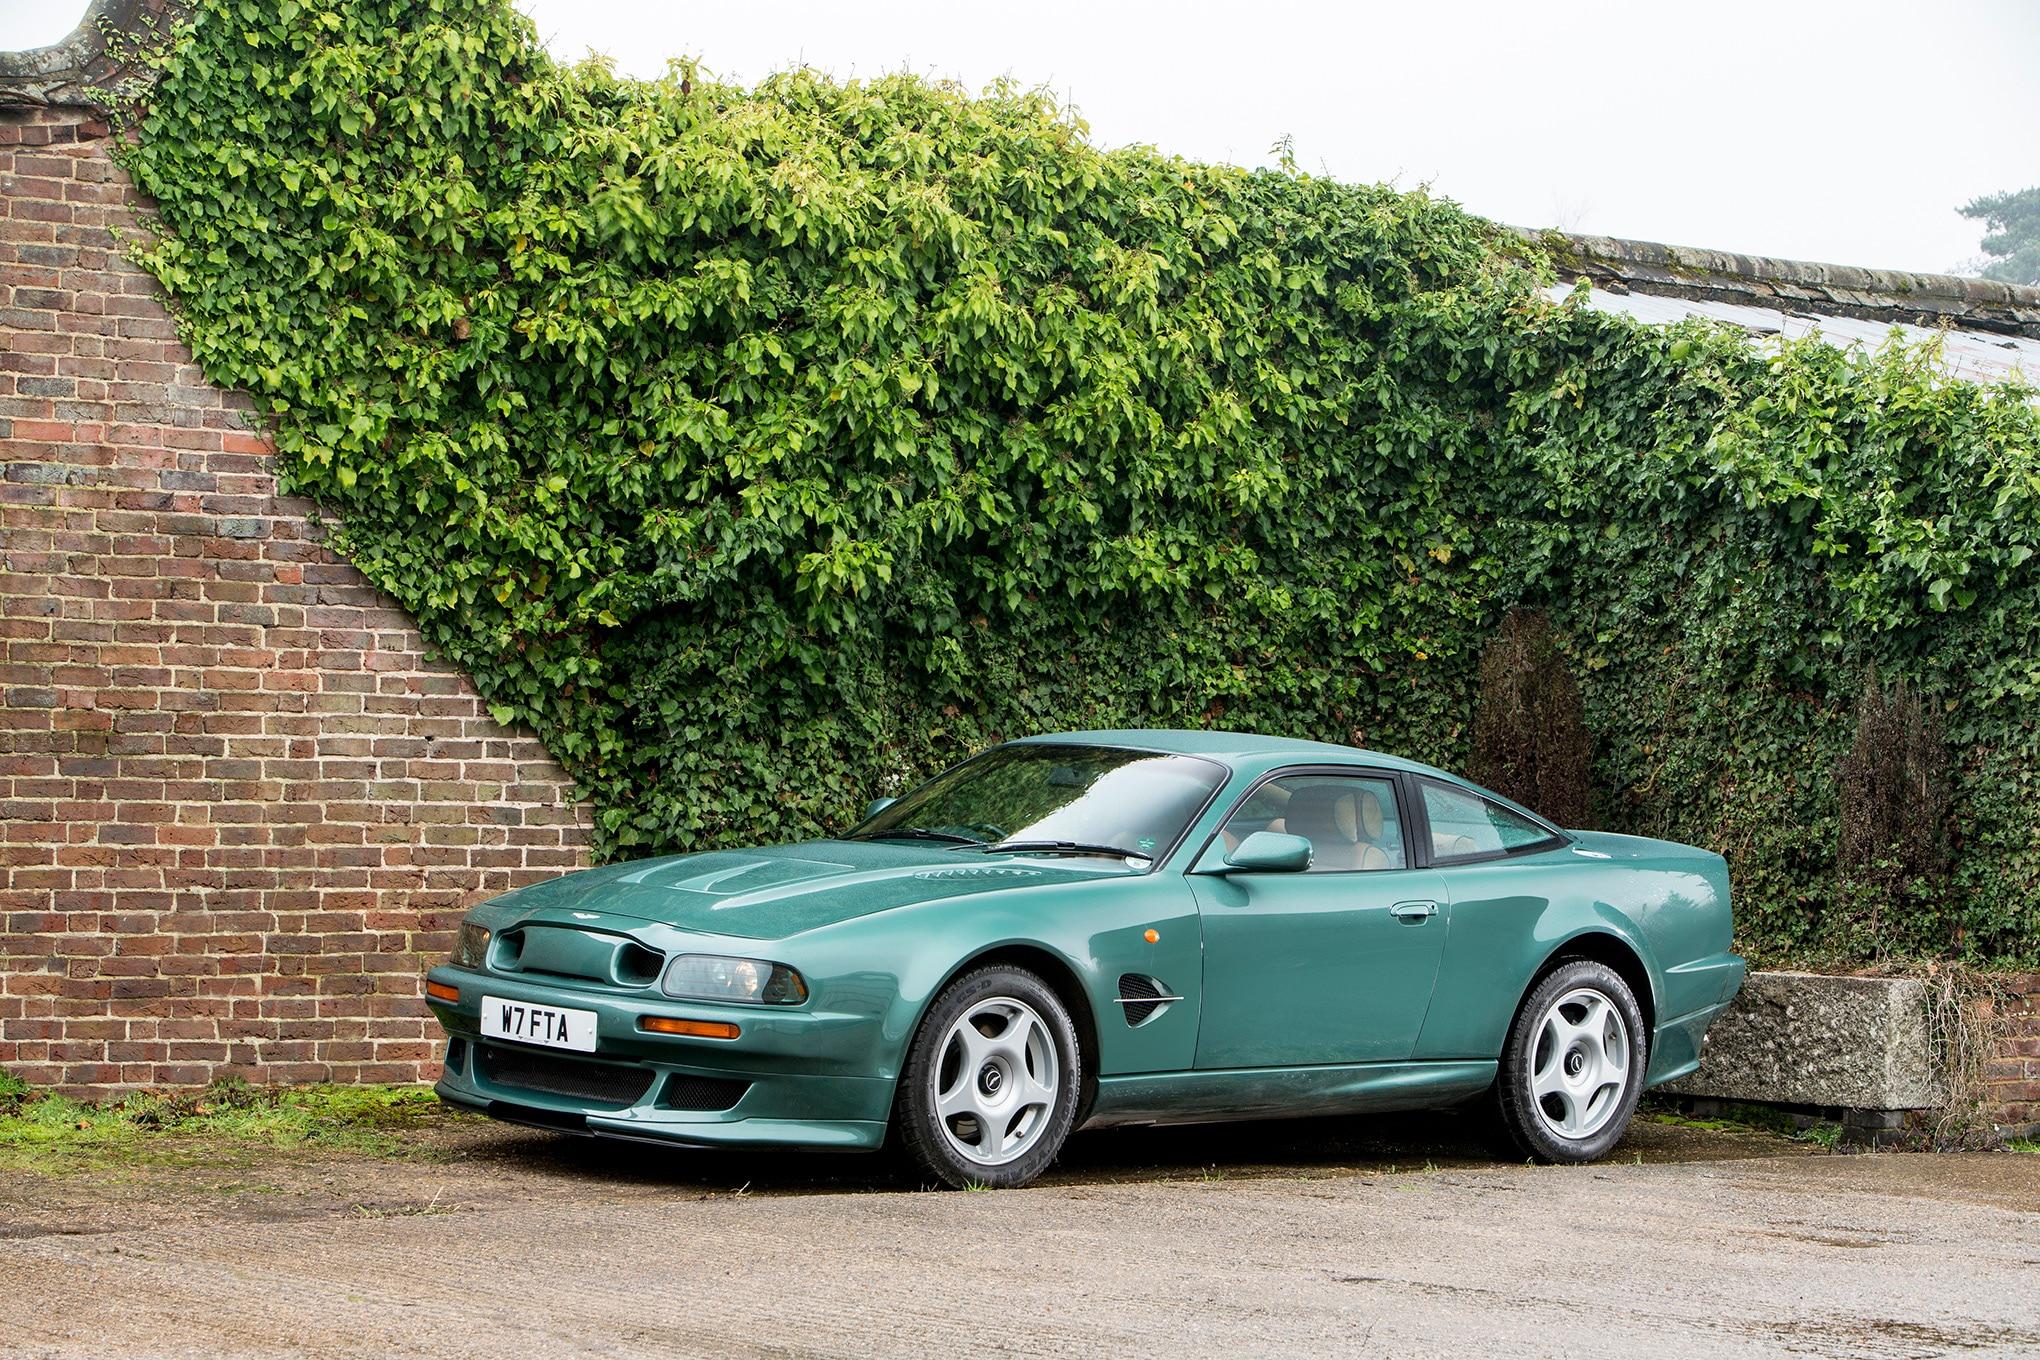 1964 Aston Martin Db5 >> 1964 DB5 Sold for $727,995 Highlights Bonhams 2017 Aston Martin Sale   Automobile Magazine